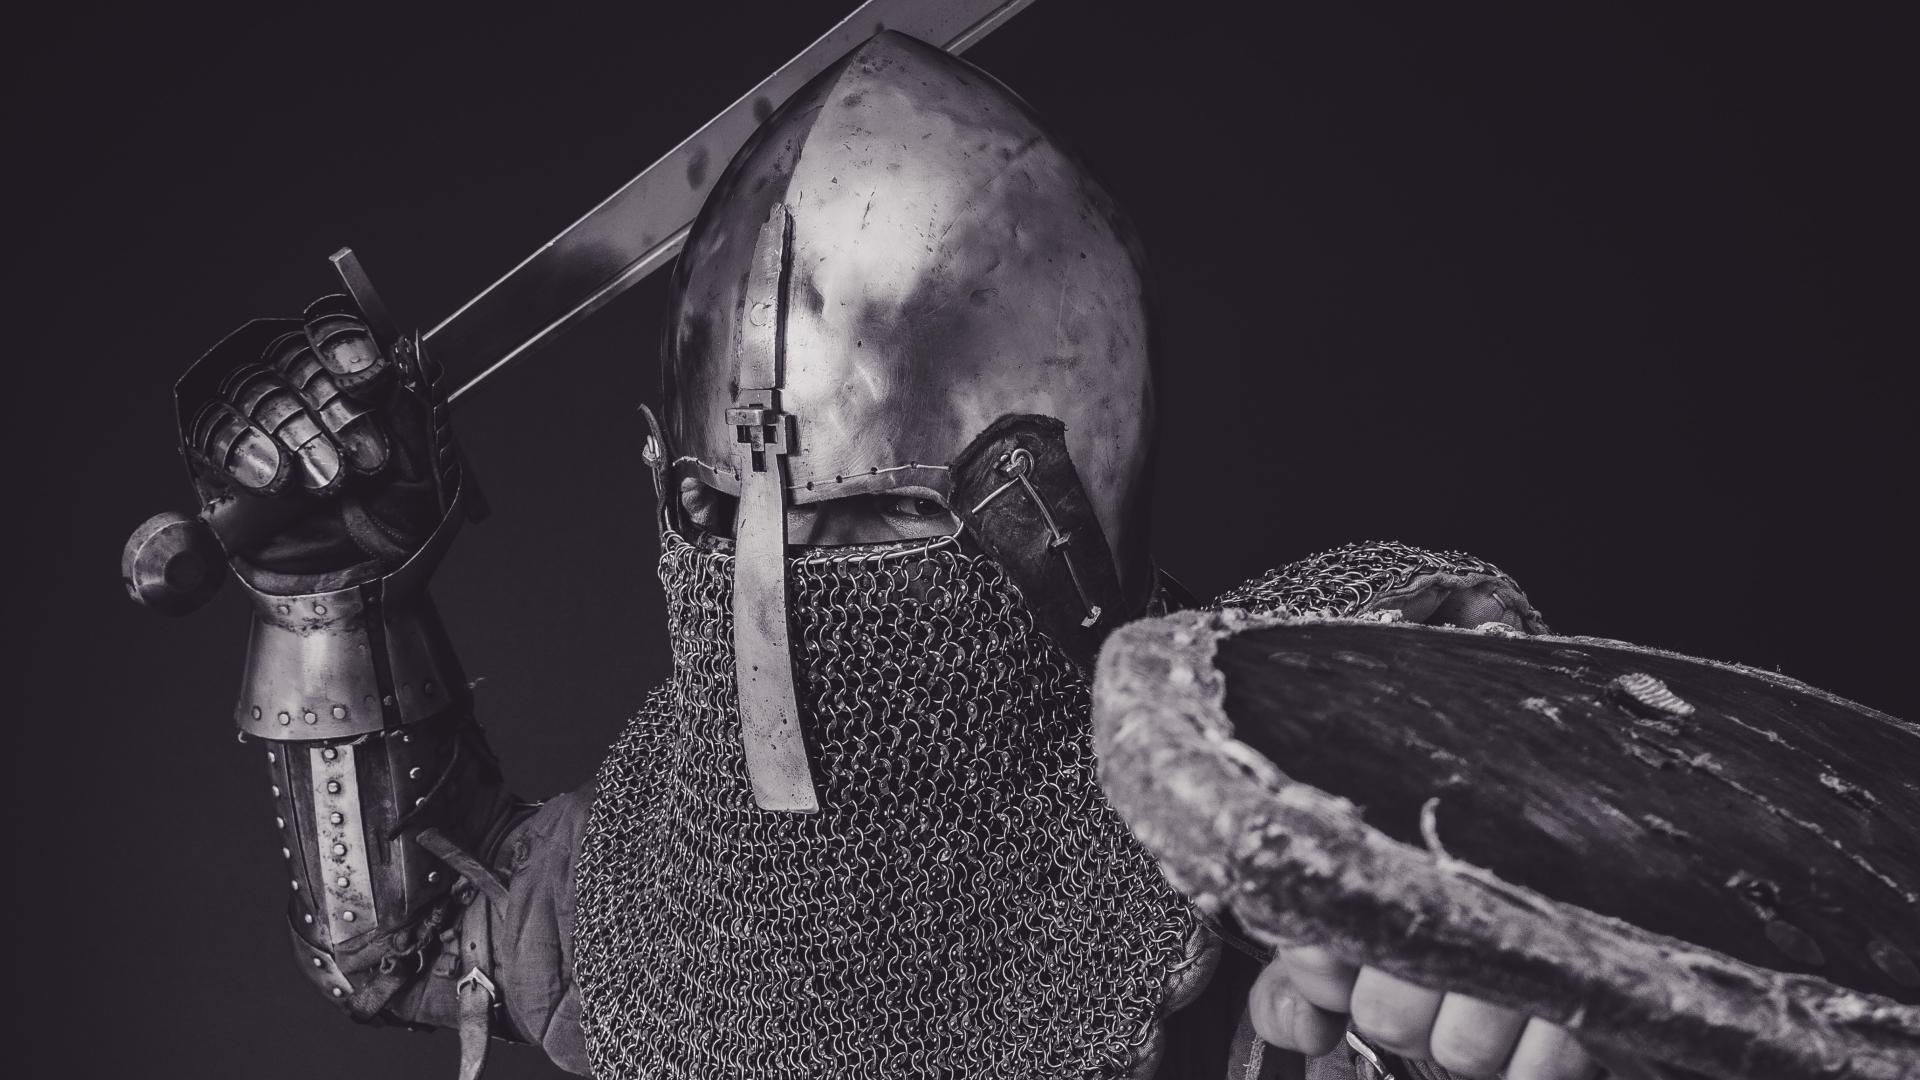 Ritter, Mittelalter, Geschichte, unsplash.com, Henry Hustava